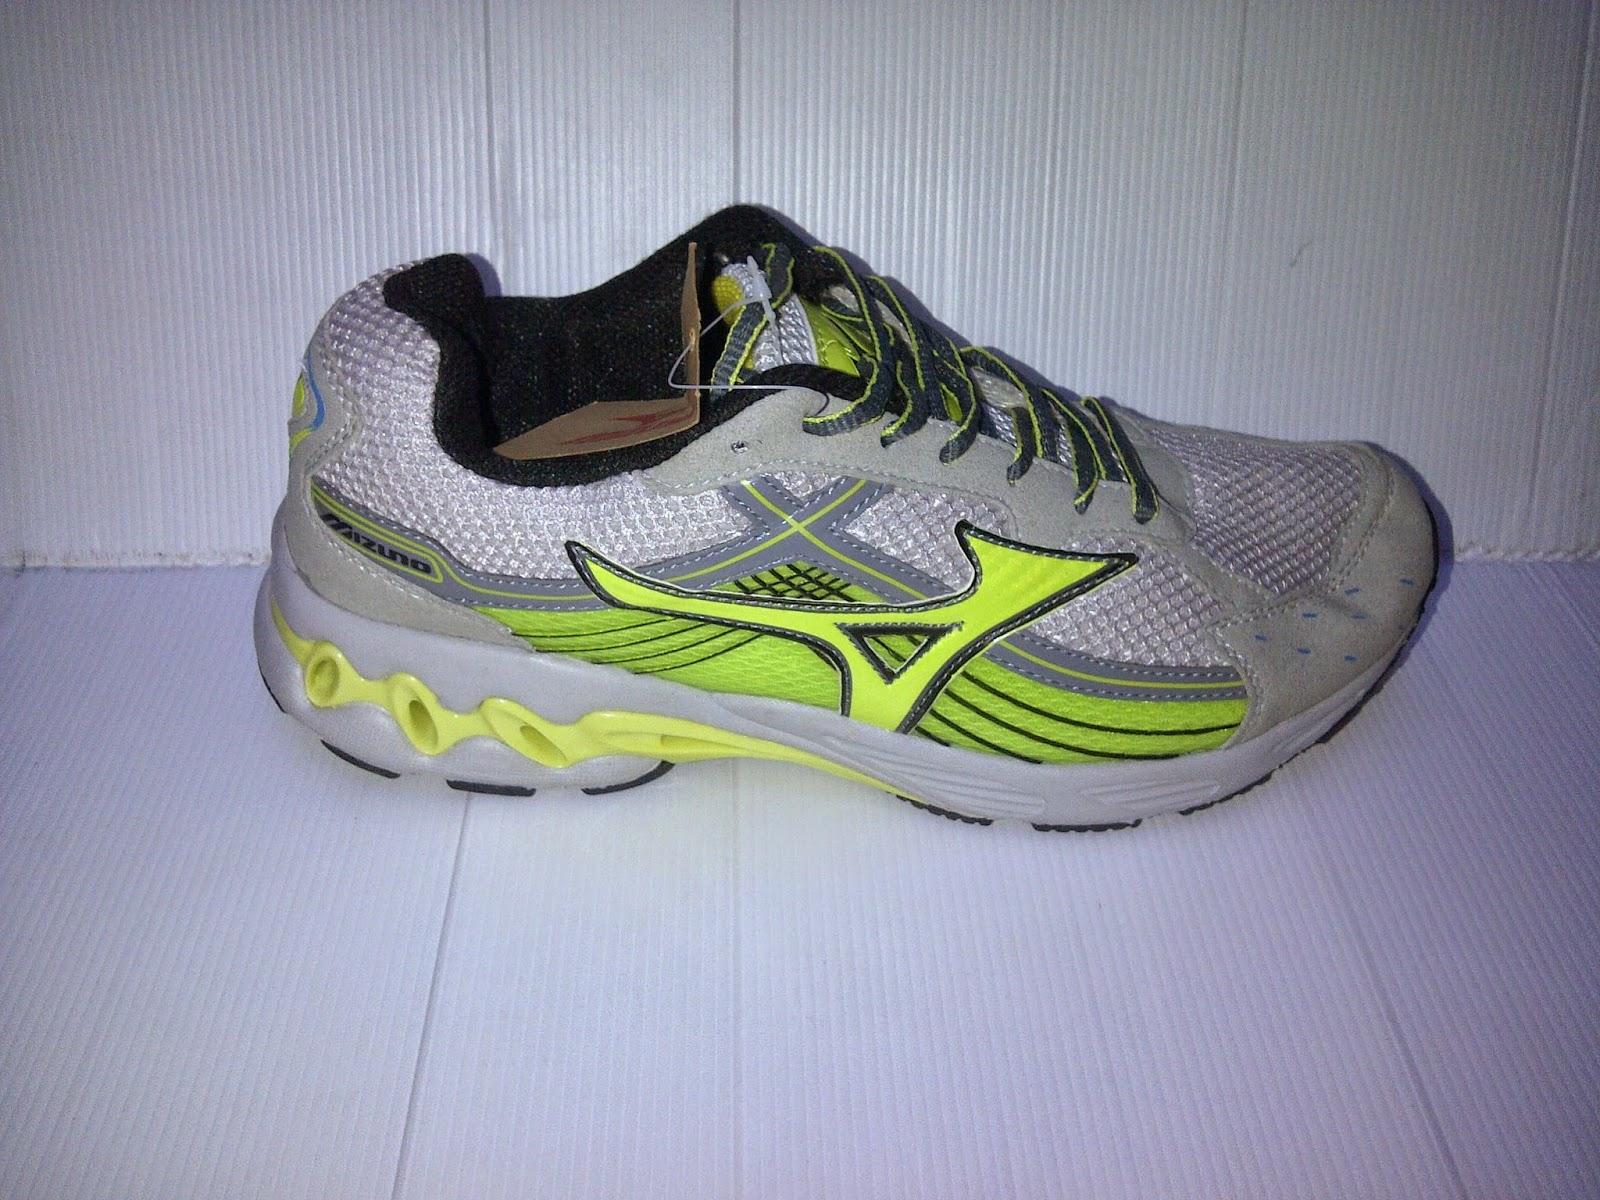 Toko Sepatu Murah , Grosir Sepatu Branded Murah , Sepatu Nike,Adidas,Reebok,Converse,Puma,Kickers,New Balance,Toko Sepatu Online Indonesia,